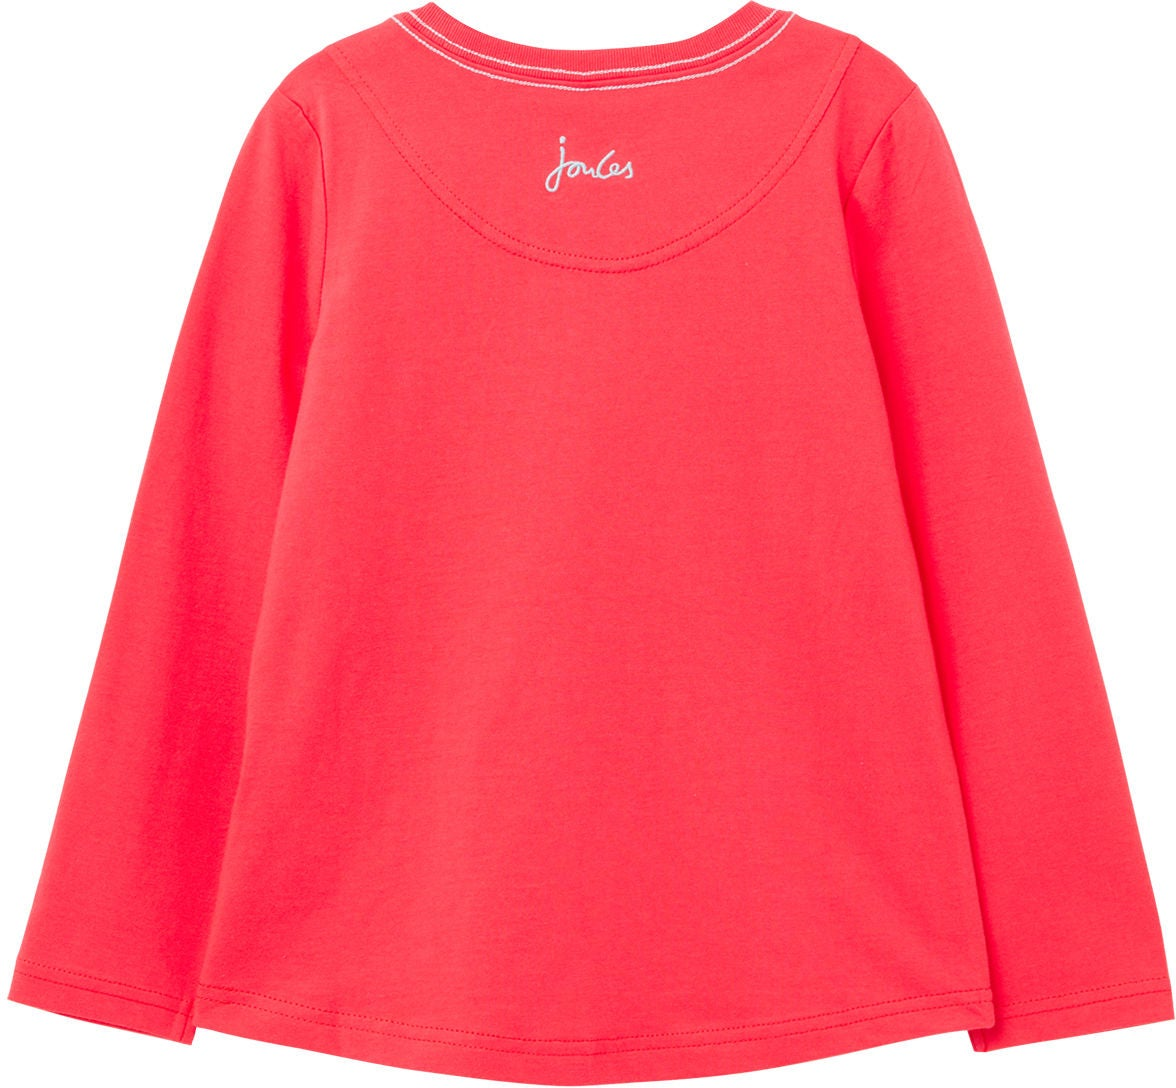 Tom Joule Ava T-shirt, Red Hearts, 3 år